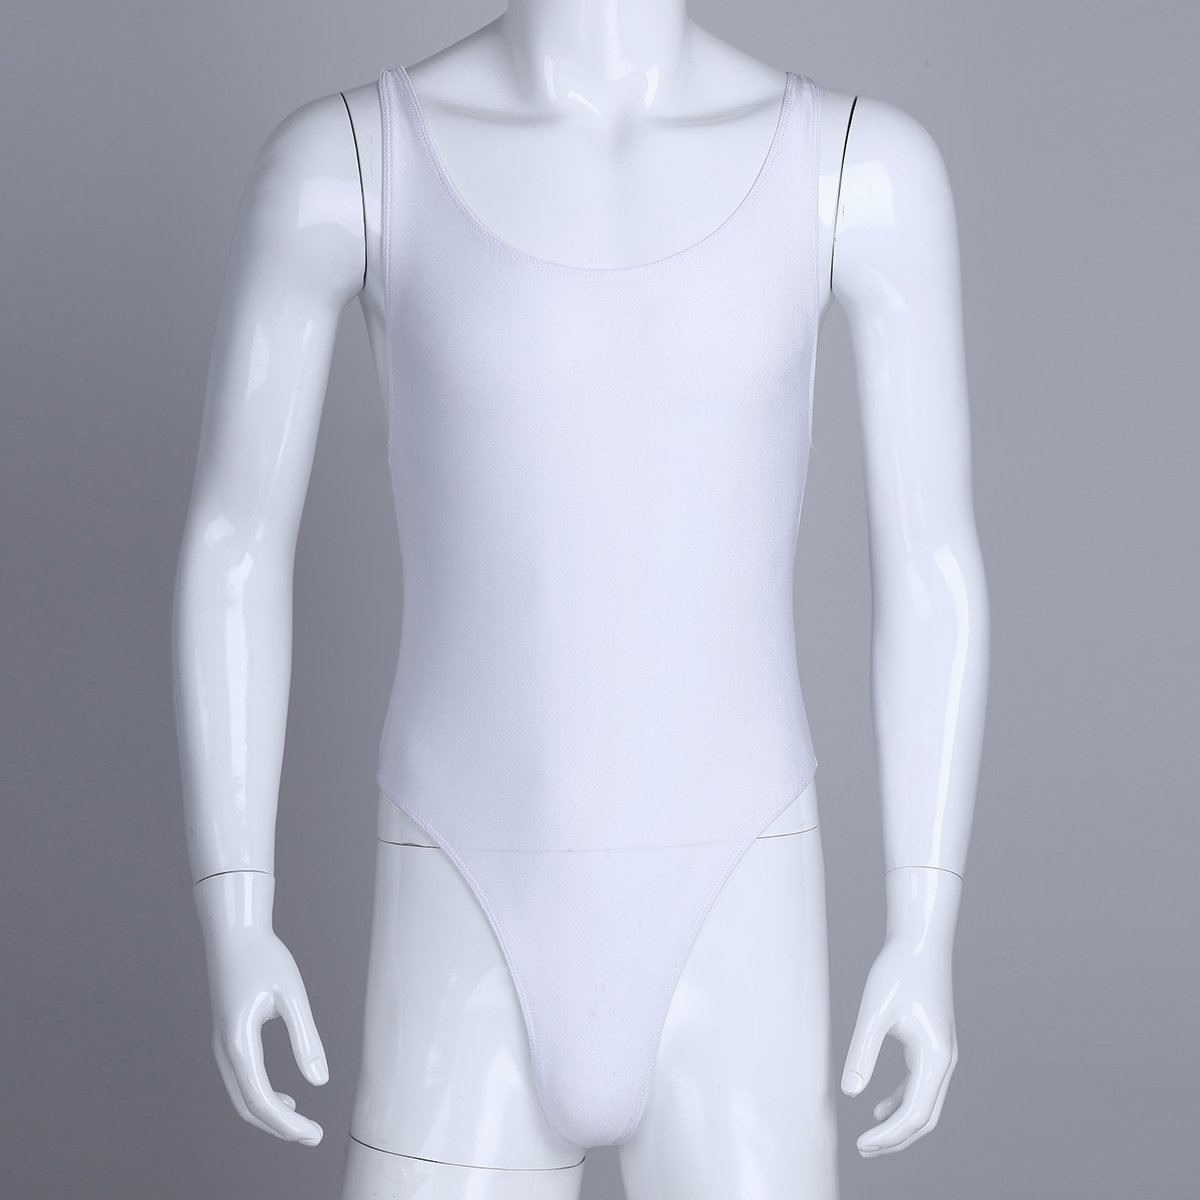 Yeahdor Mens One-Piece High Cut Thongs Underwear Wrestling Singlet Leotard Bodysuit Bikini Swimsuit